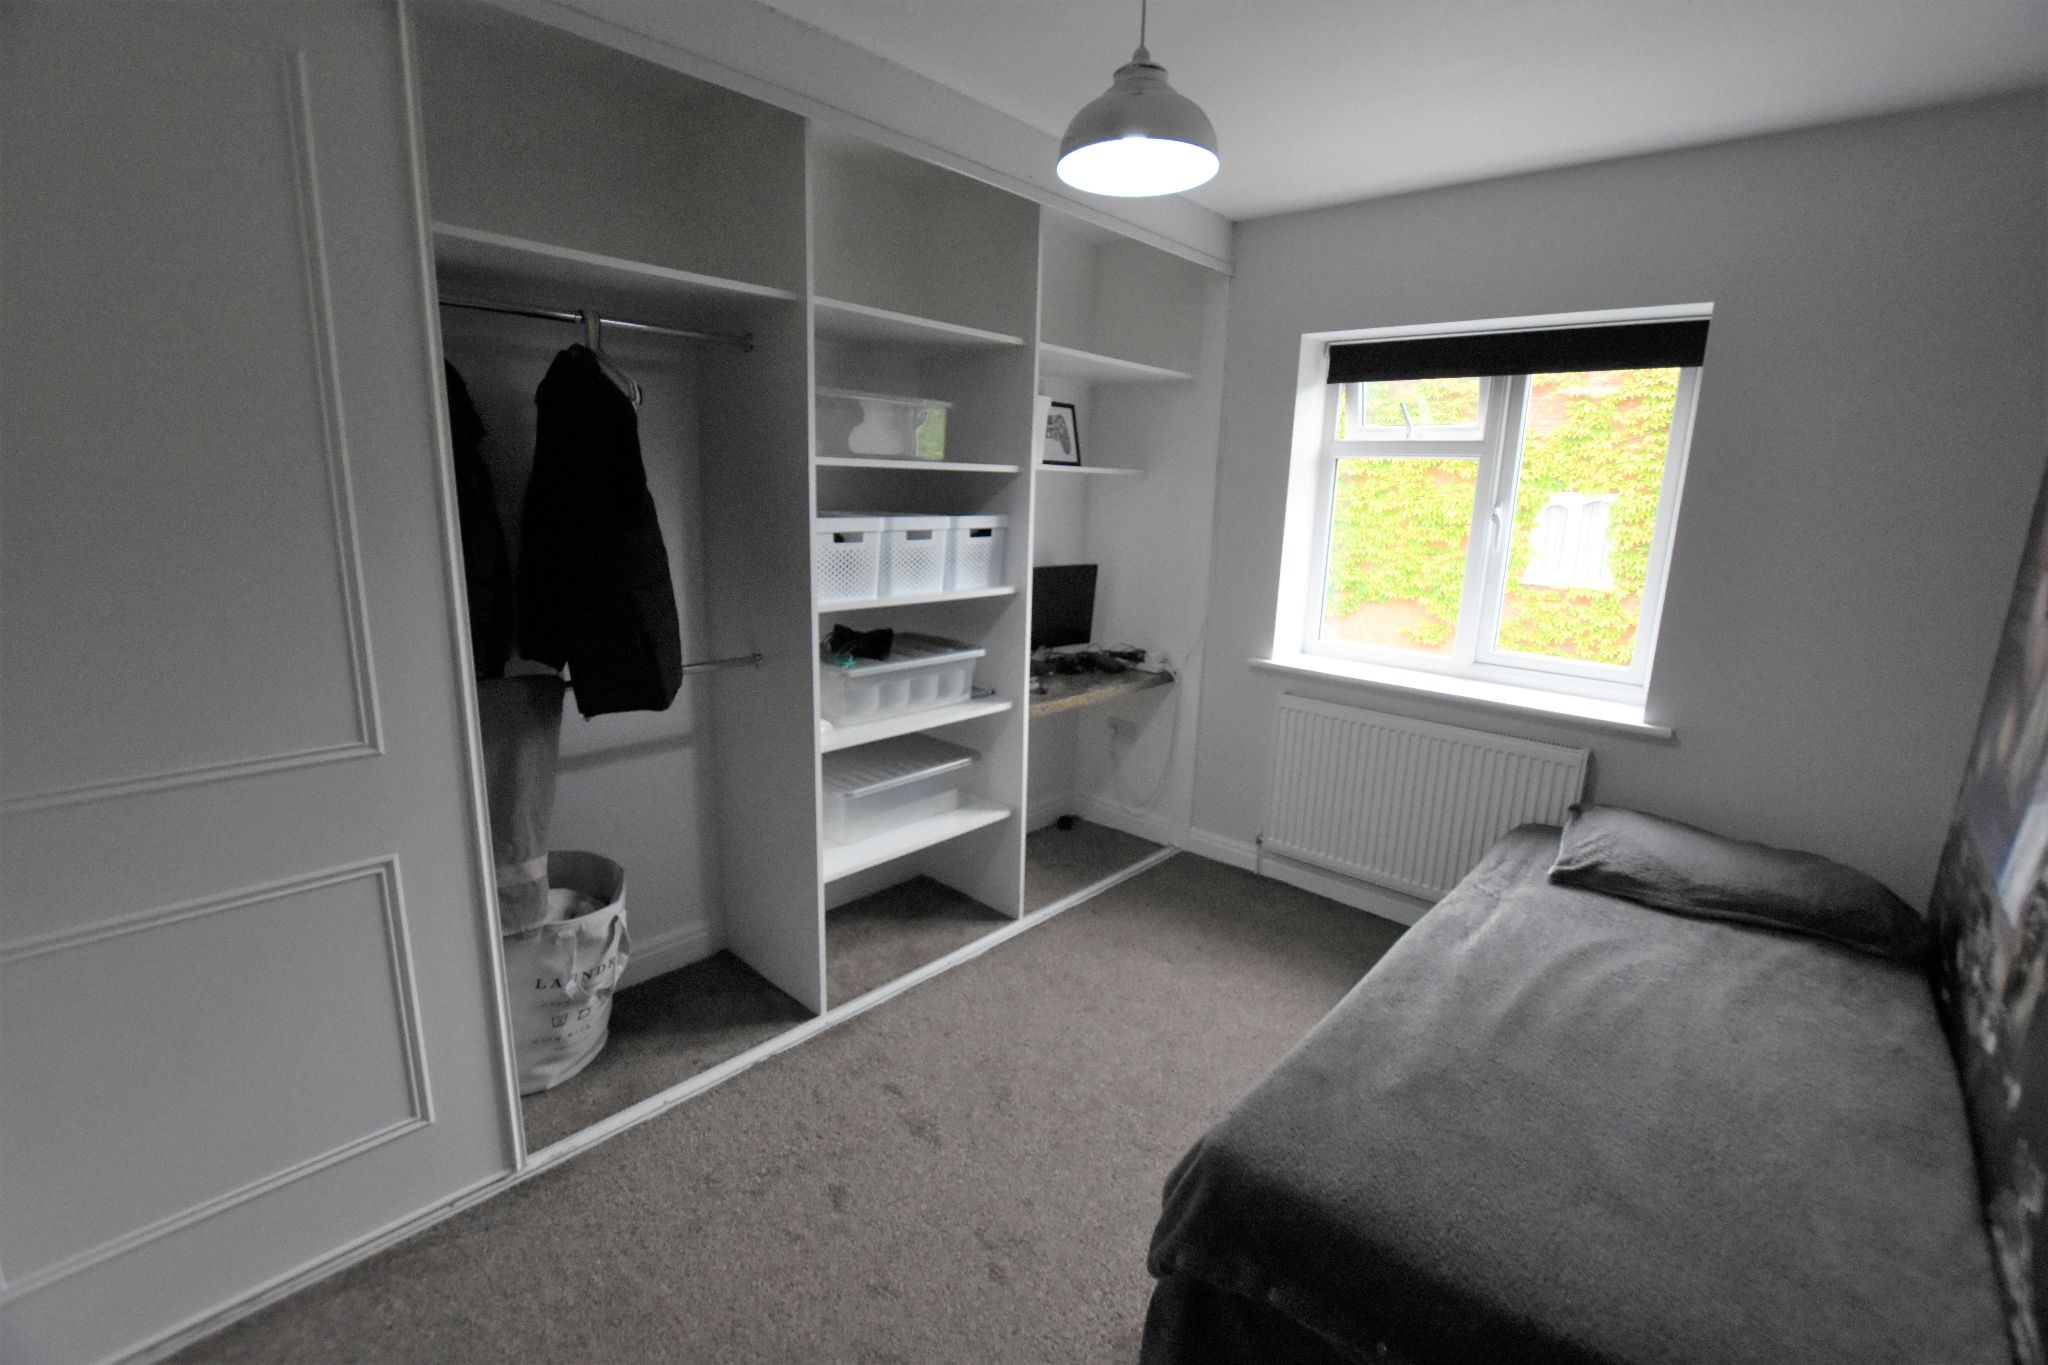 3 bedroom detached house Sold STC in Preston - Bedroom 3